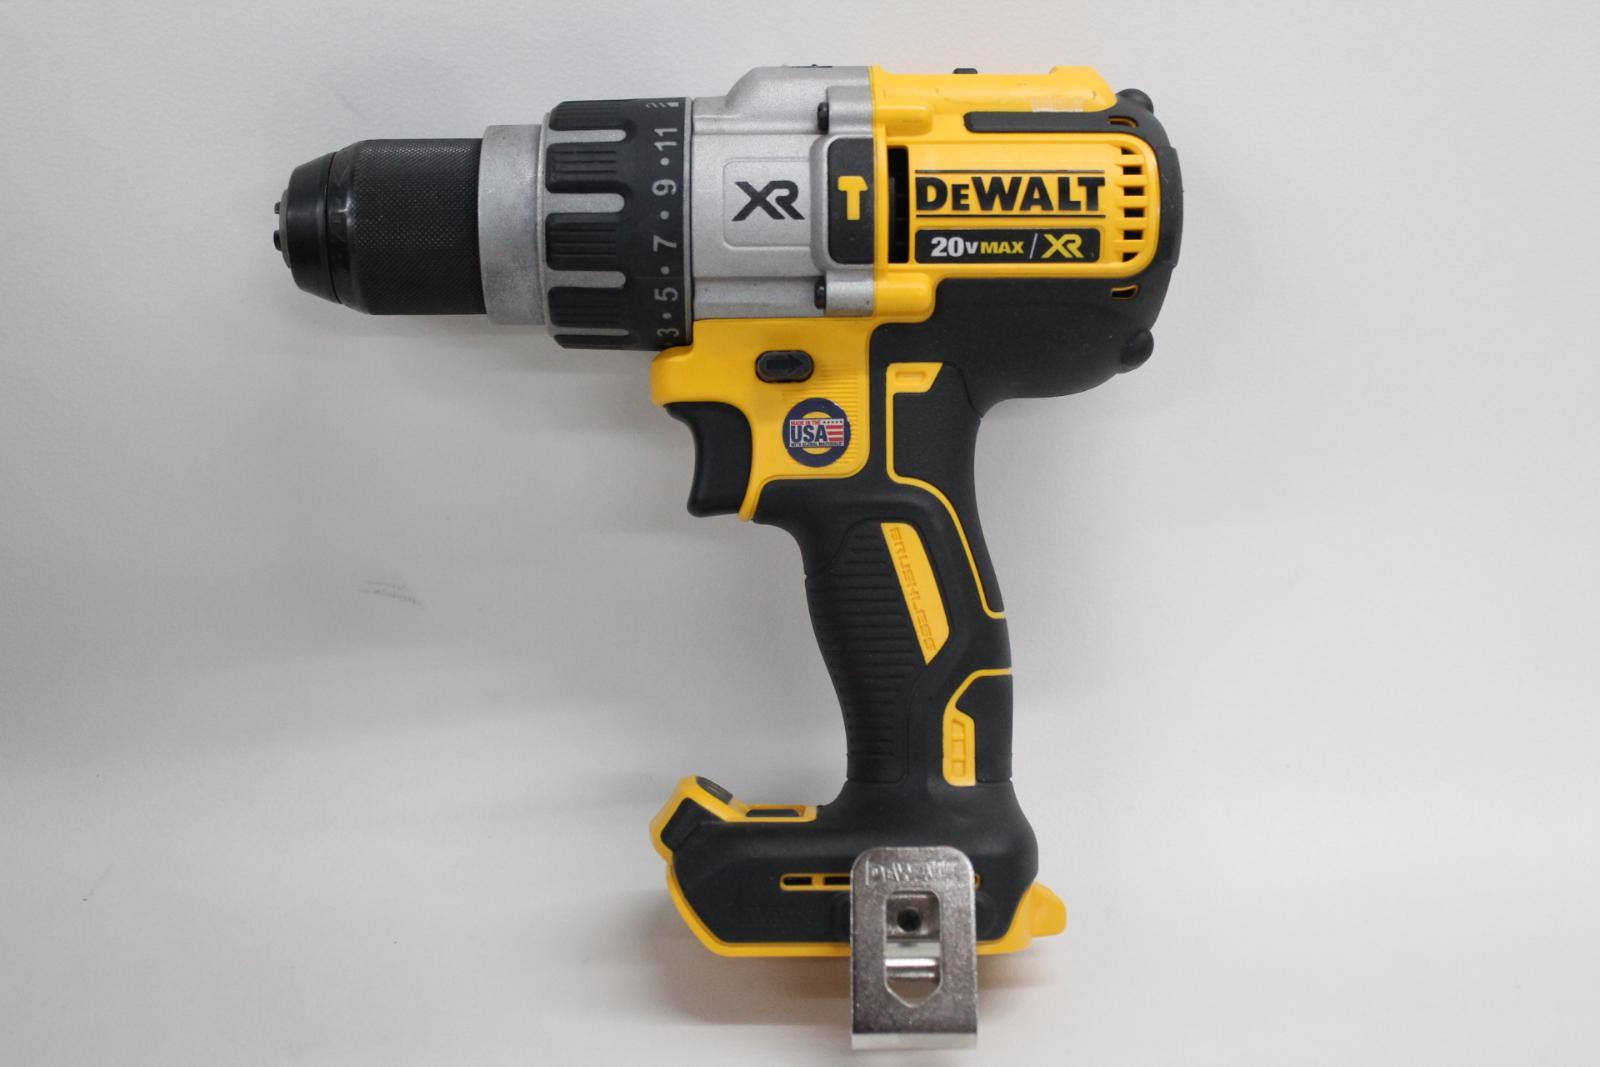 DEWALT-1-2-034-Brushless-Xr-Martillo-Taladro-Inalambrico-Controlador-Inalambrico-Modelo-DCD996-20v miniatura 11